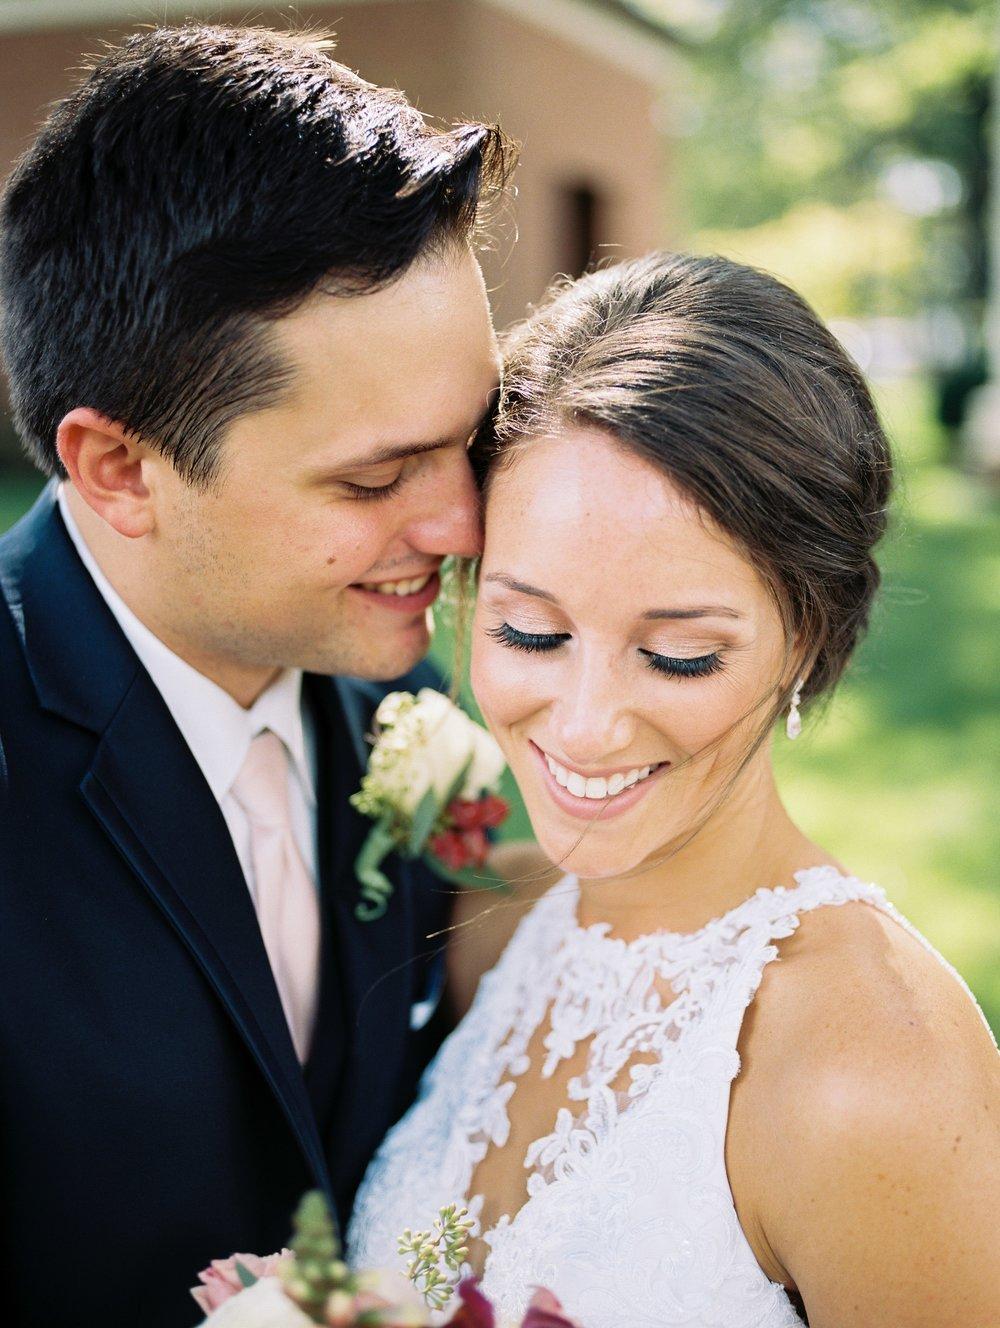 Christi & Michael - Wed - © Kaitlyn Stoddard Photography - 0607.jpg